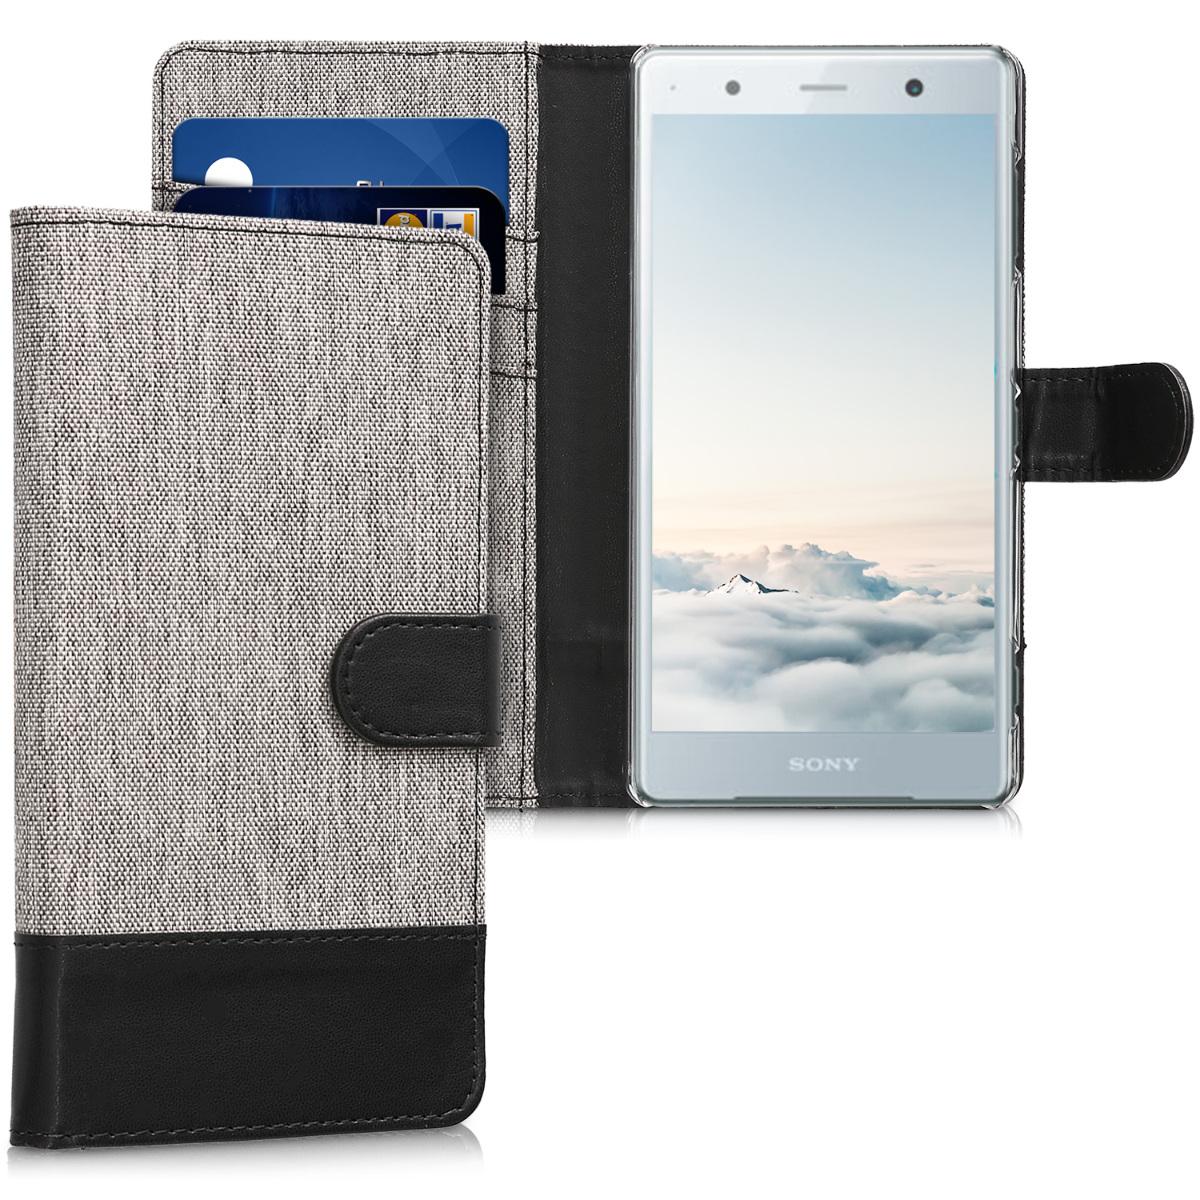 KW Θήκη Πορτοφόλι Sony Xperia XZ2 Premium - Συνθετικό δέρμα - Grey / Black (45013.01)